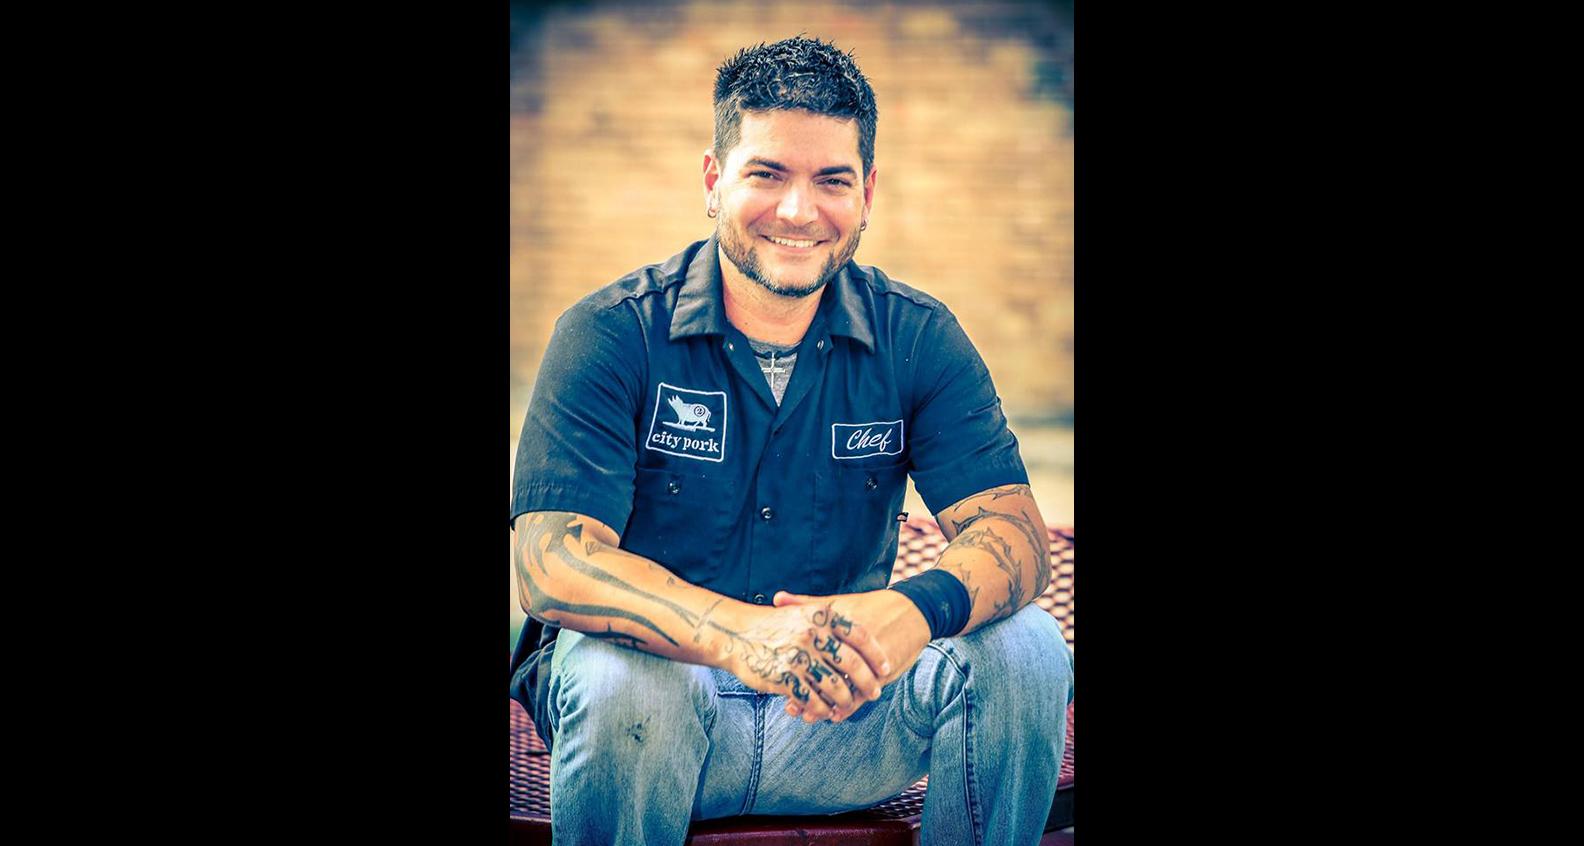 Chef Ryan Andre